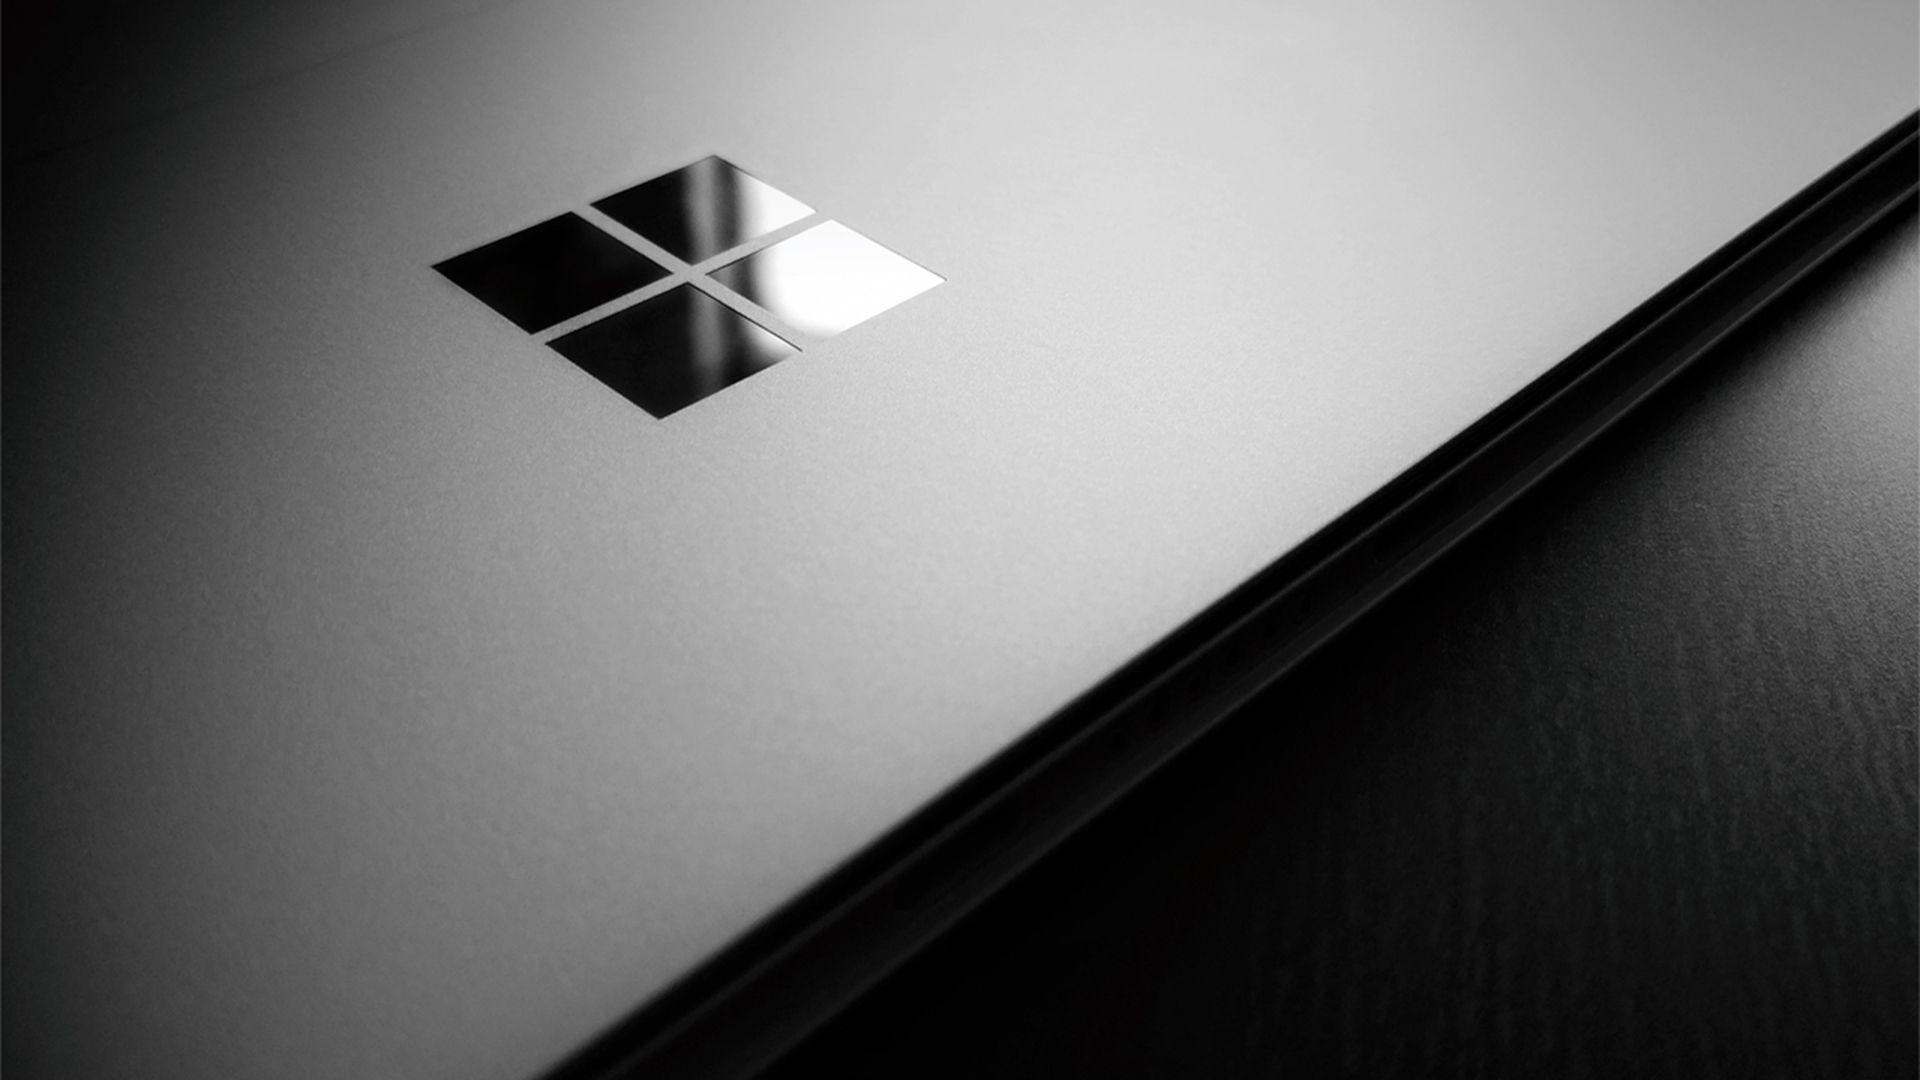 Surface Pro pics